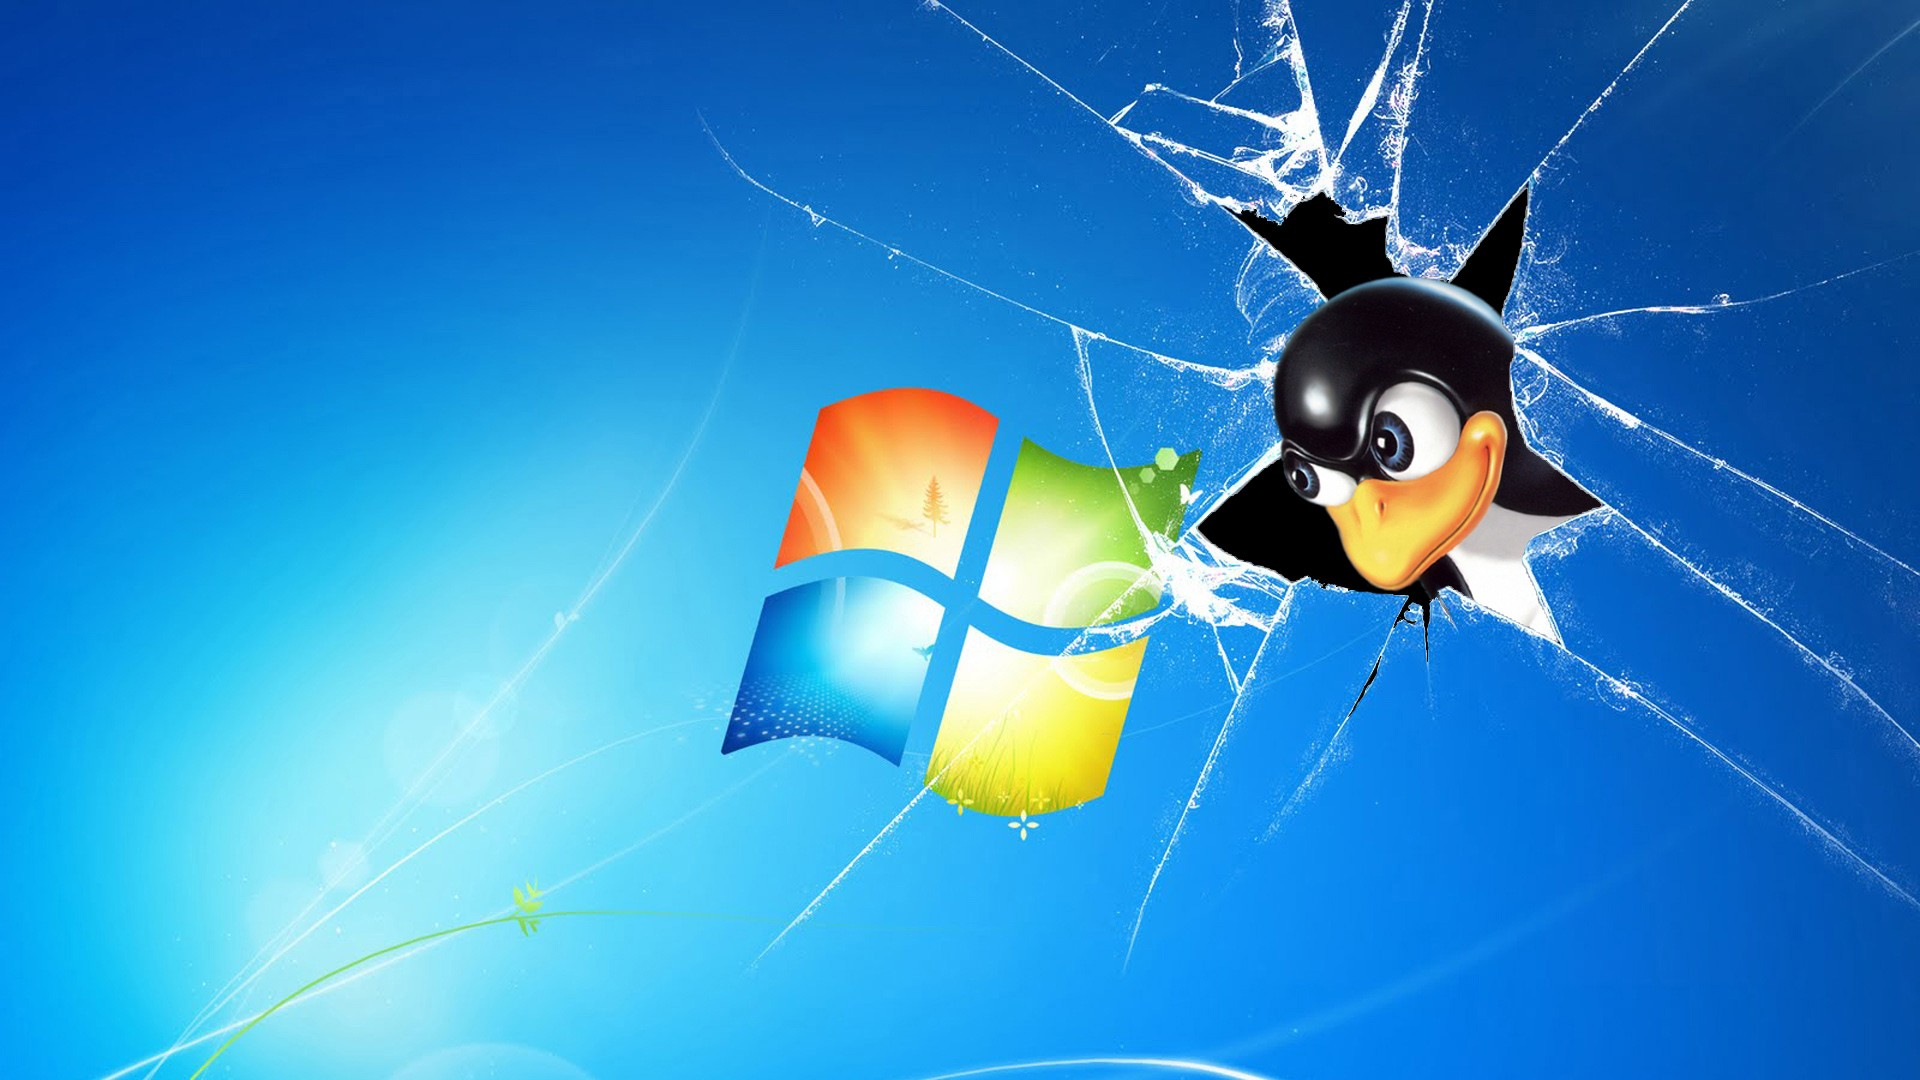 perehod na linux logo e1435339938376